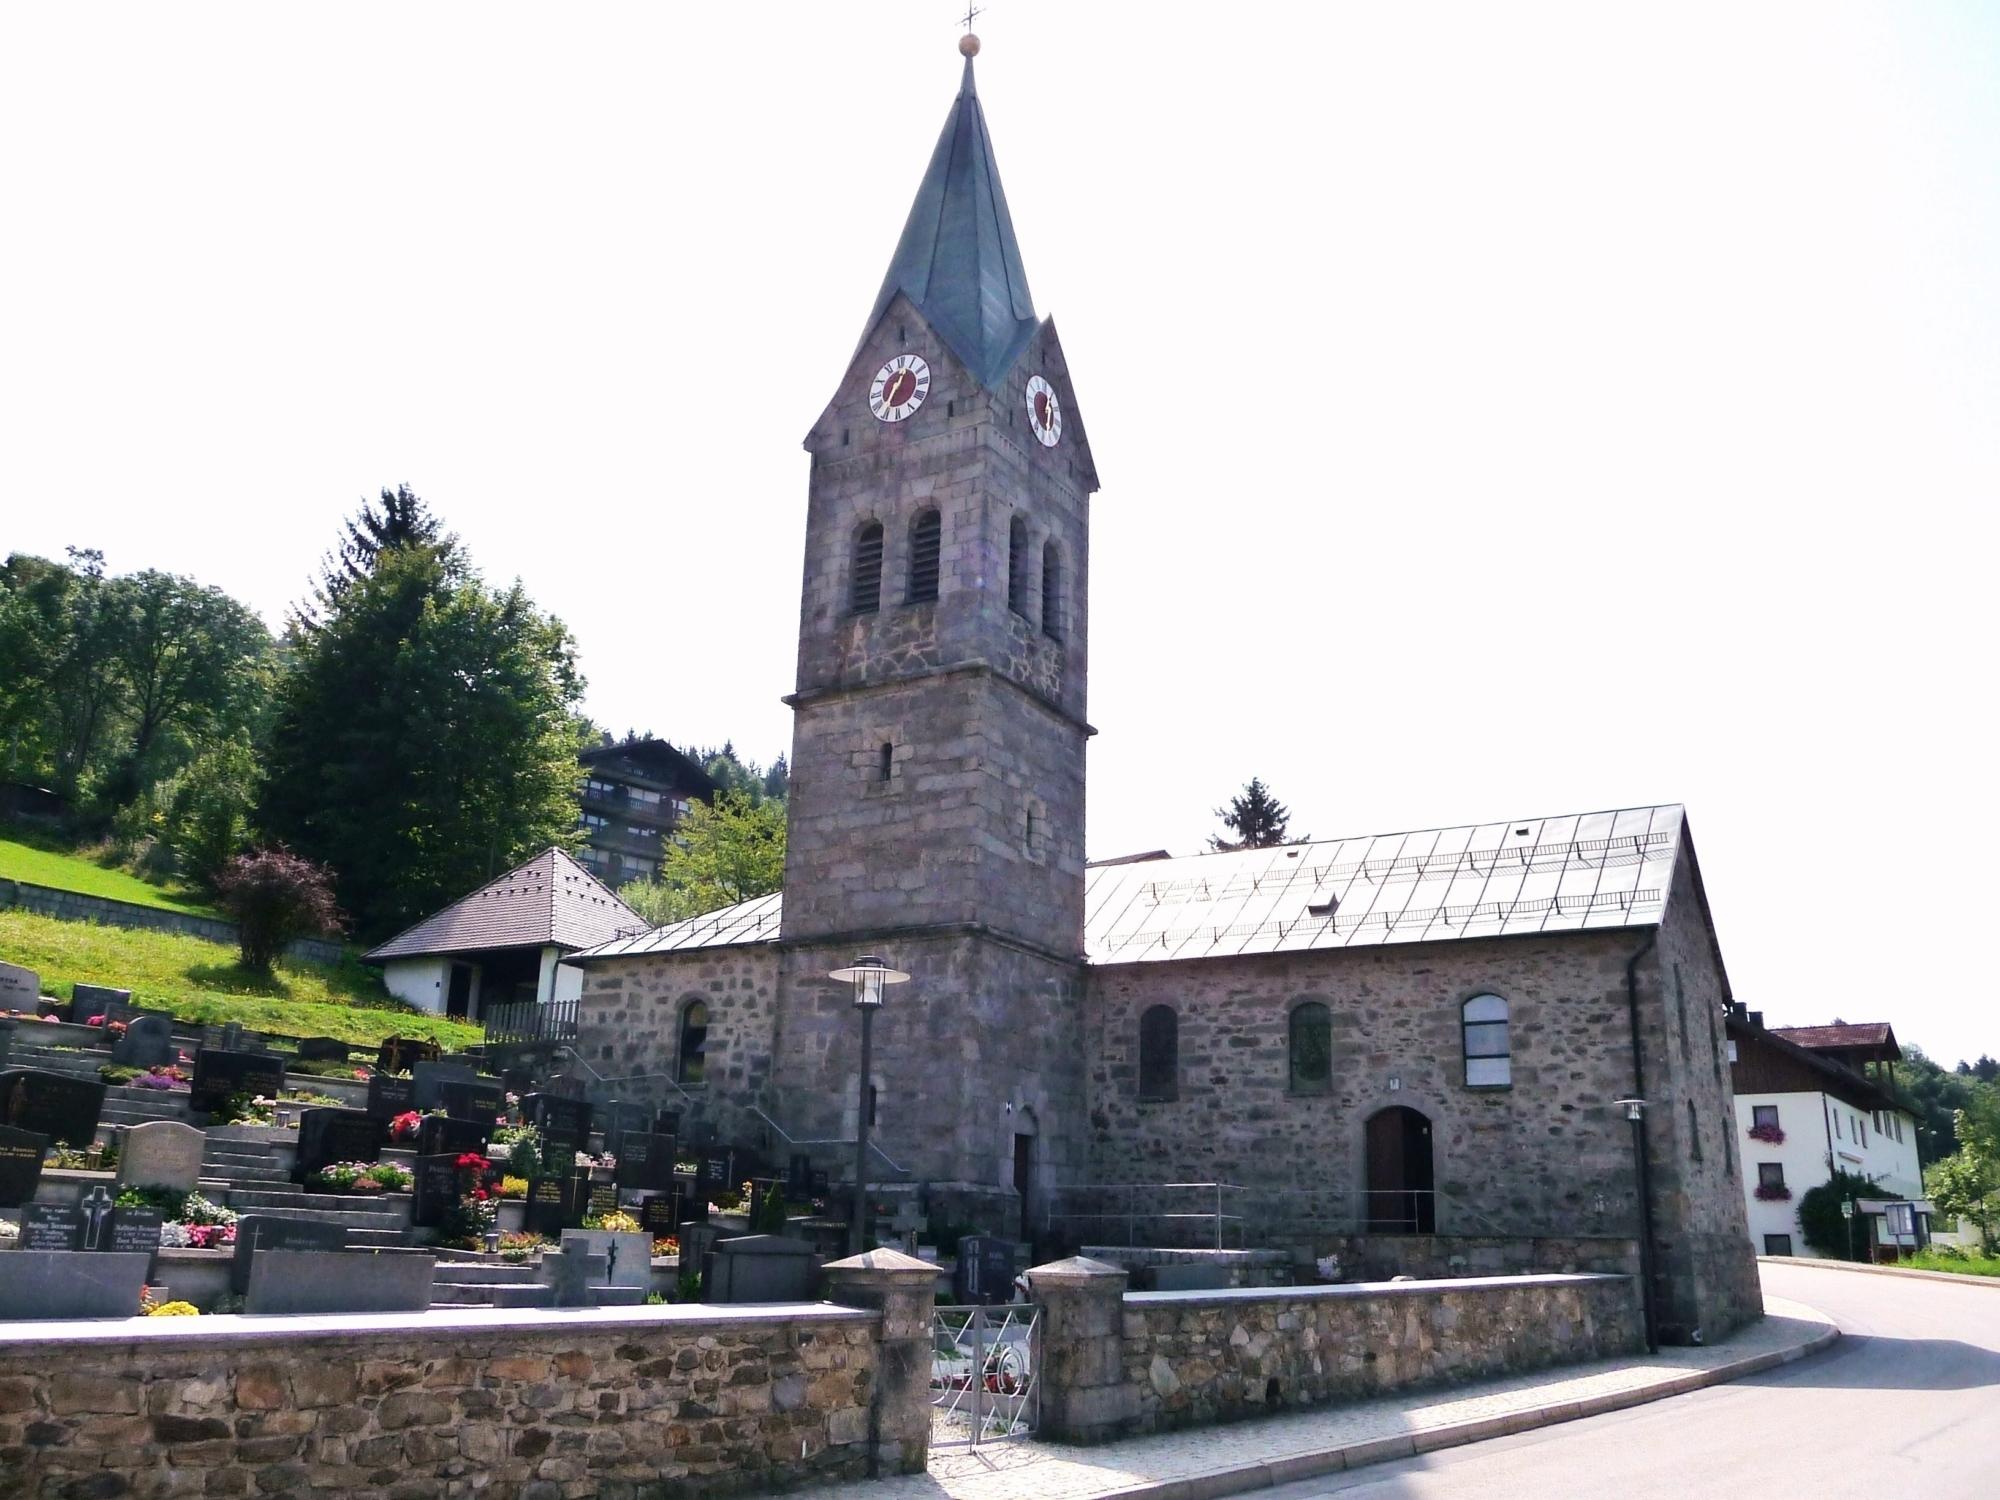 Pfarrkirche Langfurth 28 Sch C3 B6fweg29